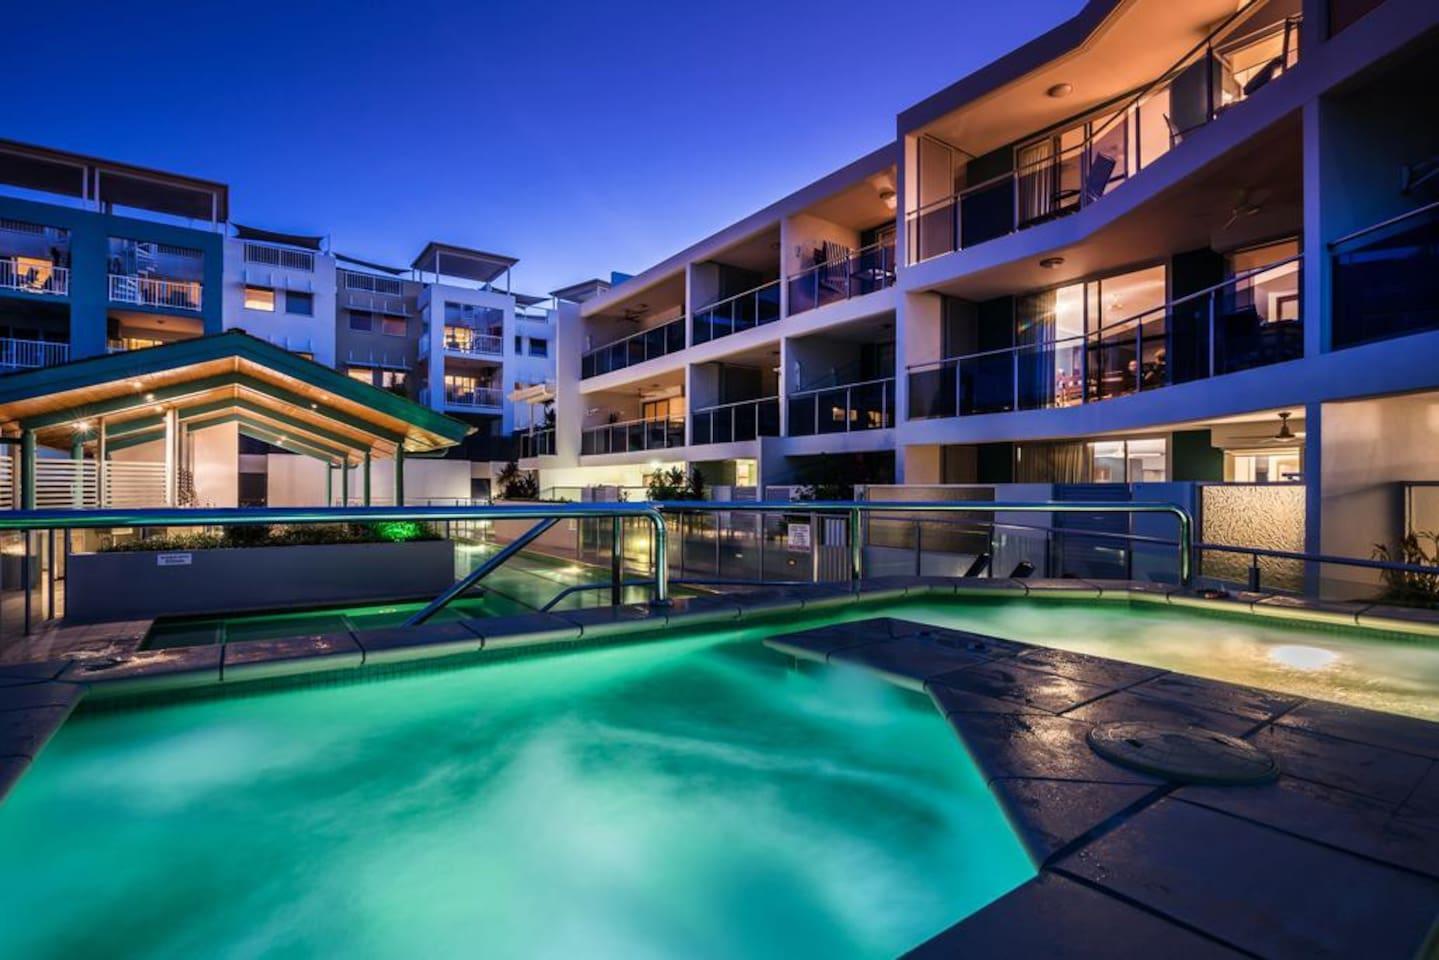 Apartment 2BR Coolum Beach    Rooftop Terrace   Spa   Tennis   Pool photo 26289858